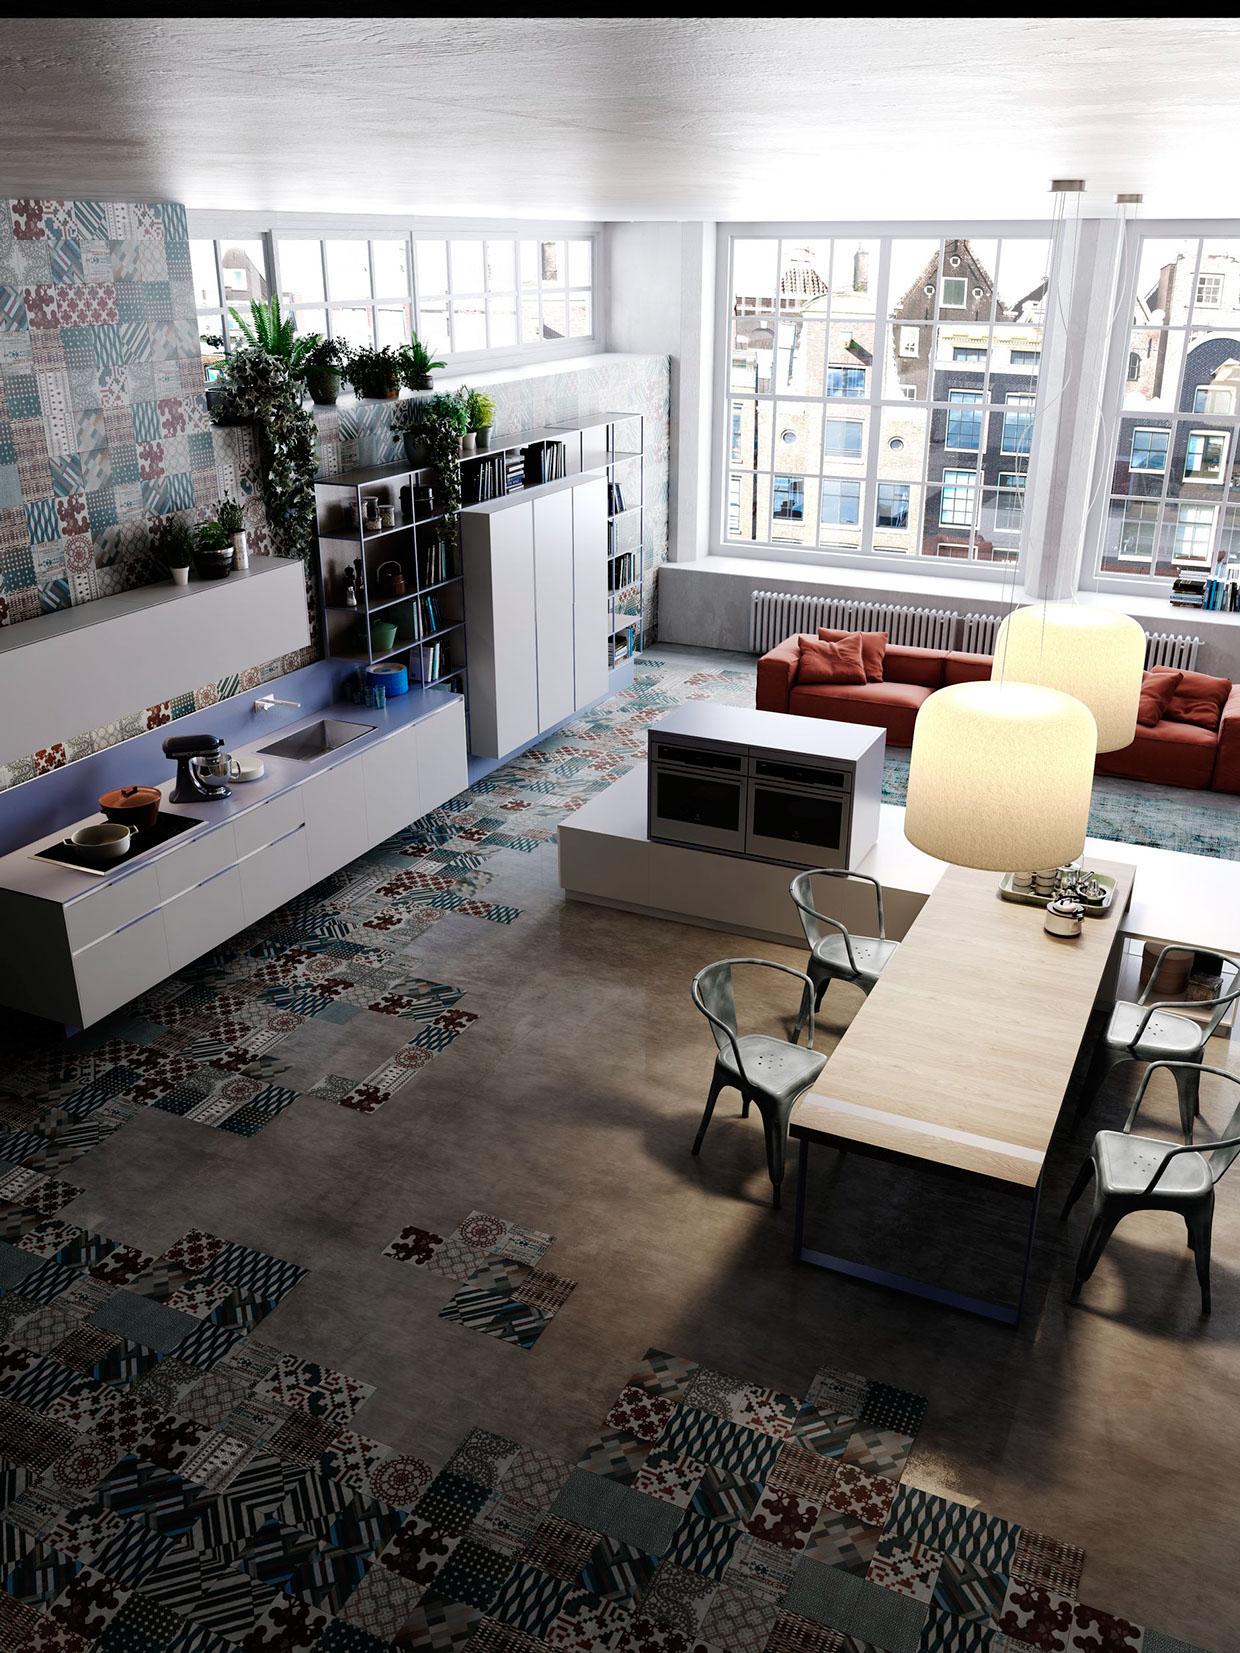 7 Inspirational Loft Interiors